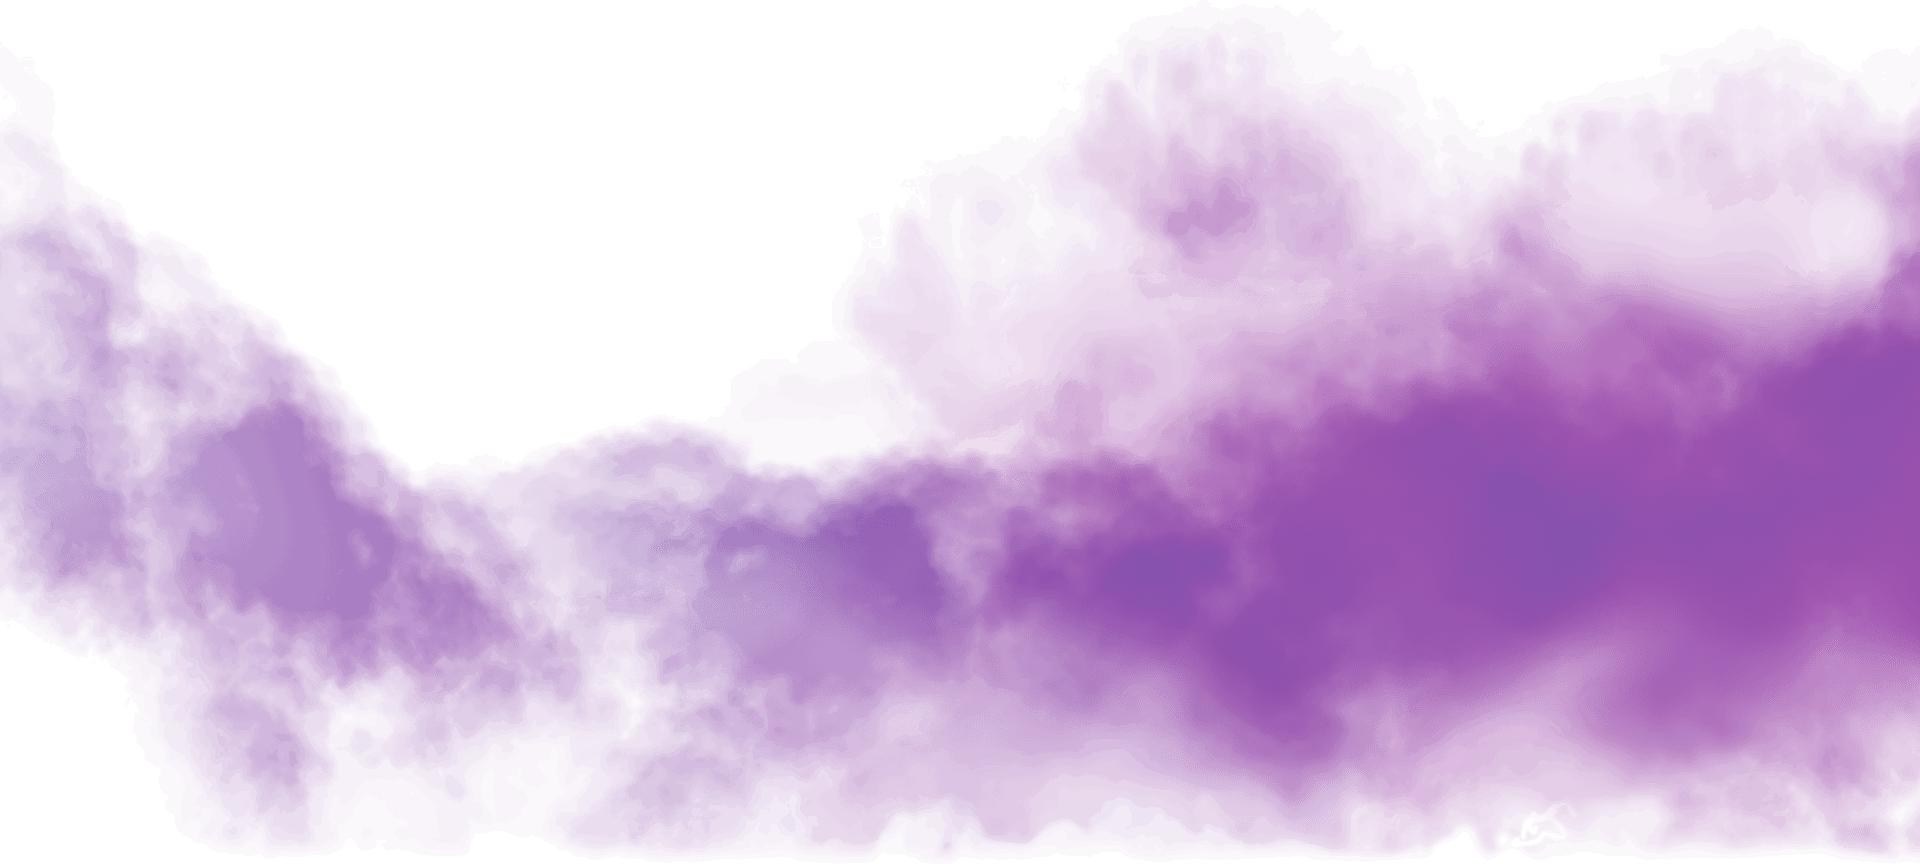 Purple Smoke Png, Transparent Png #445517 - Dlf.pt